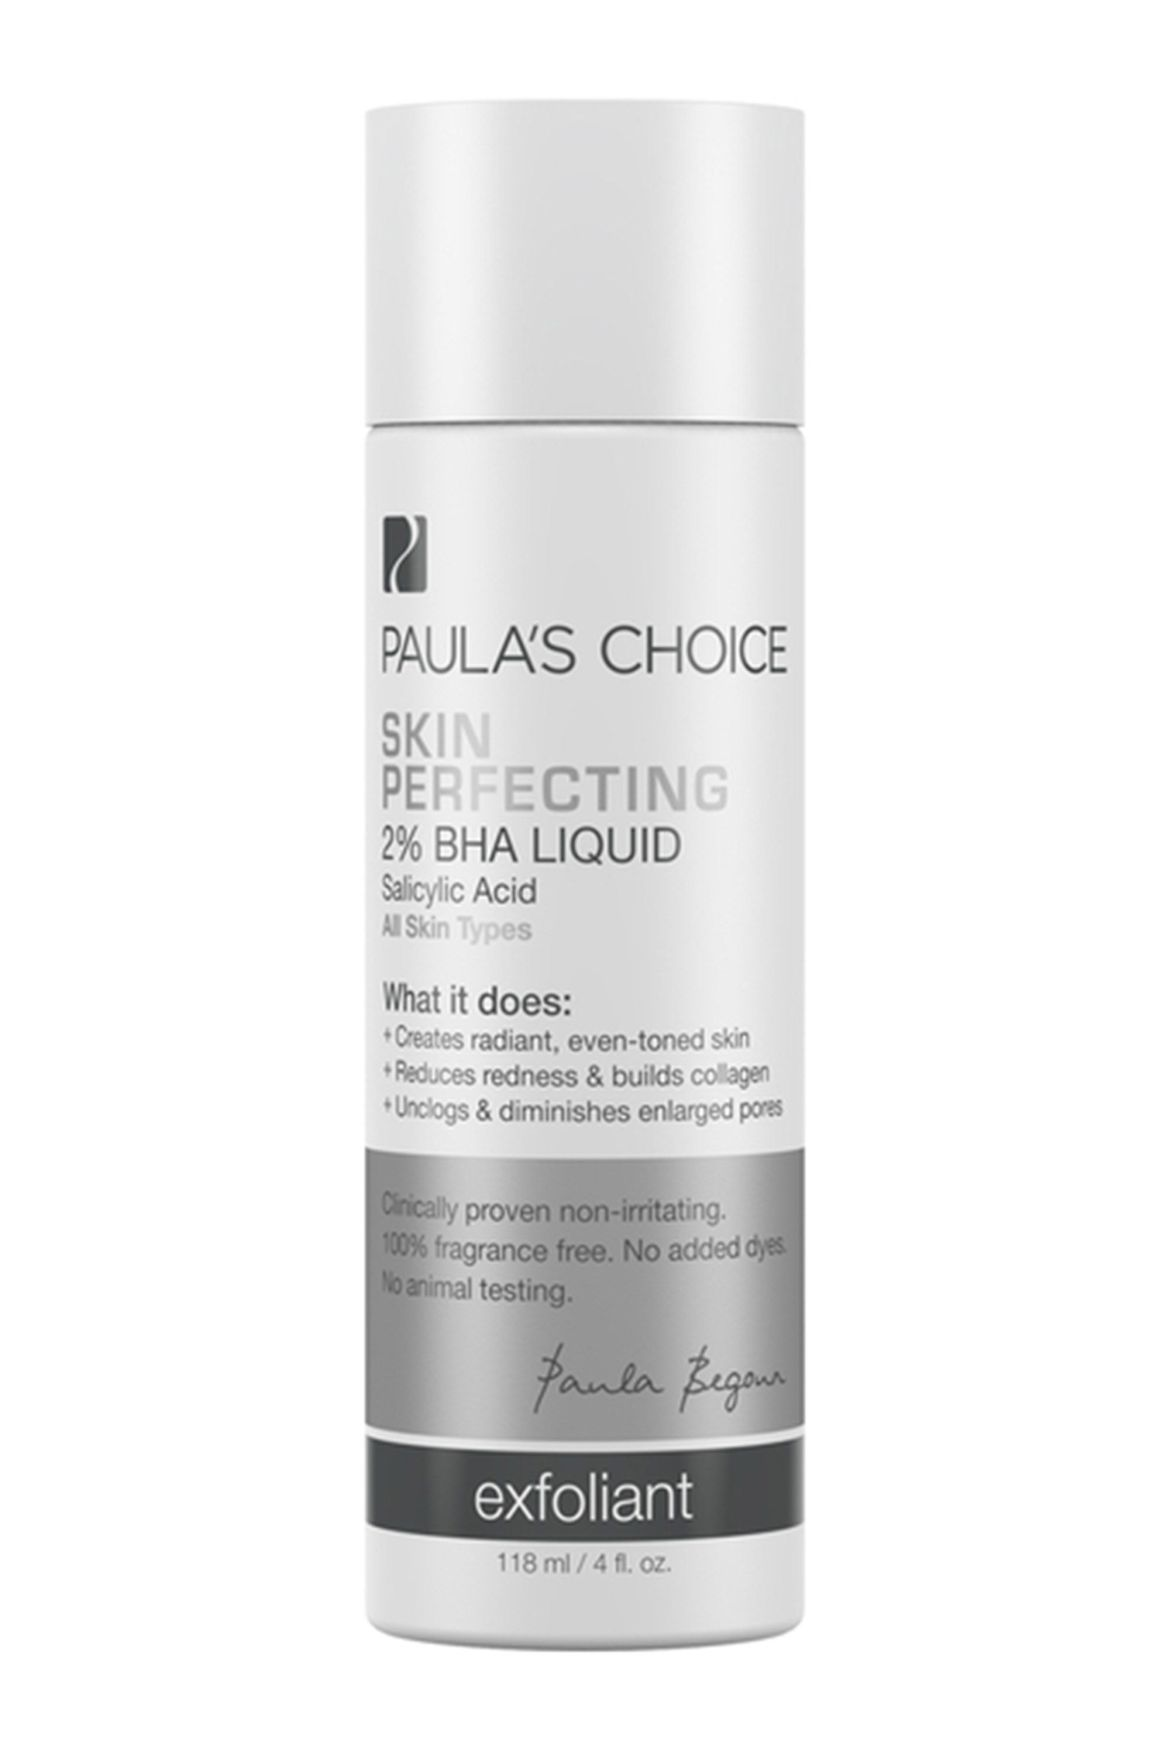 Paula's Choice Skin Perfecting Liquid